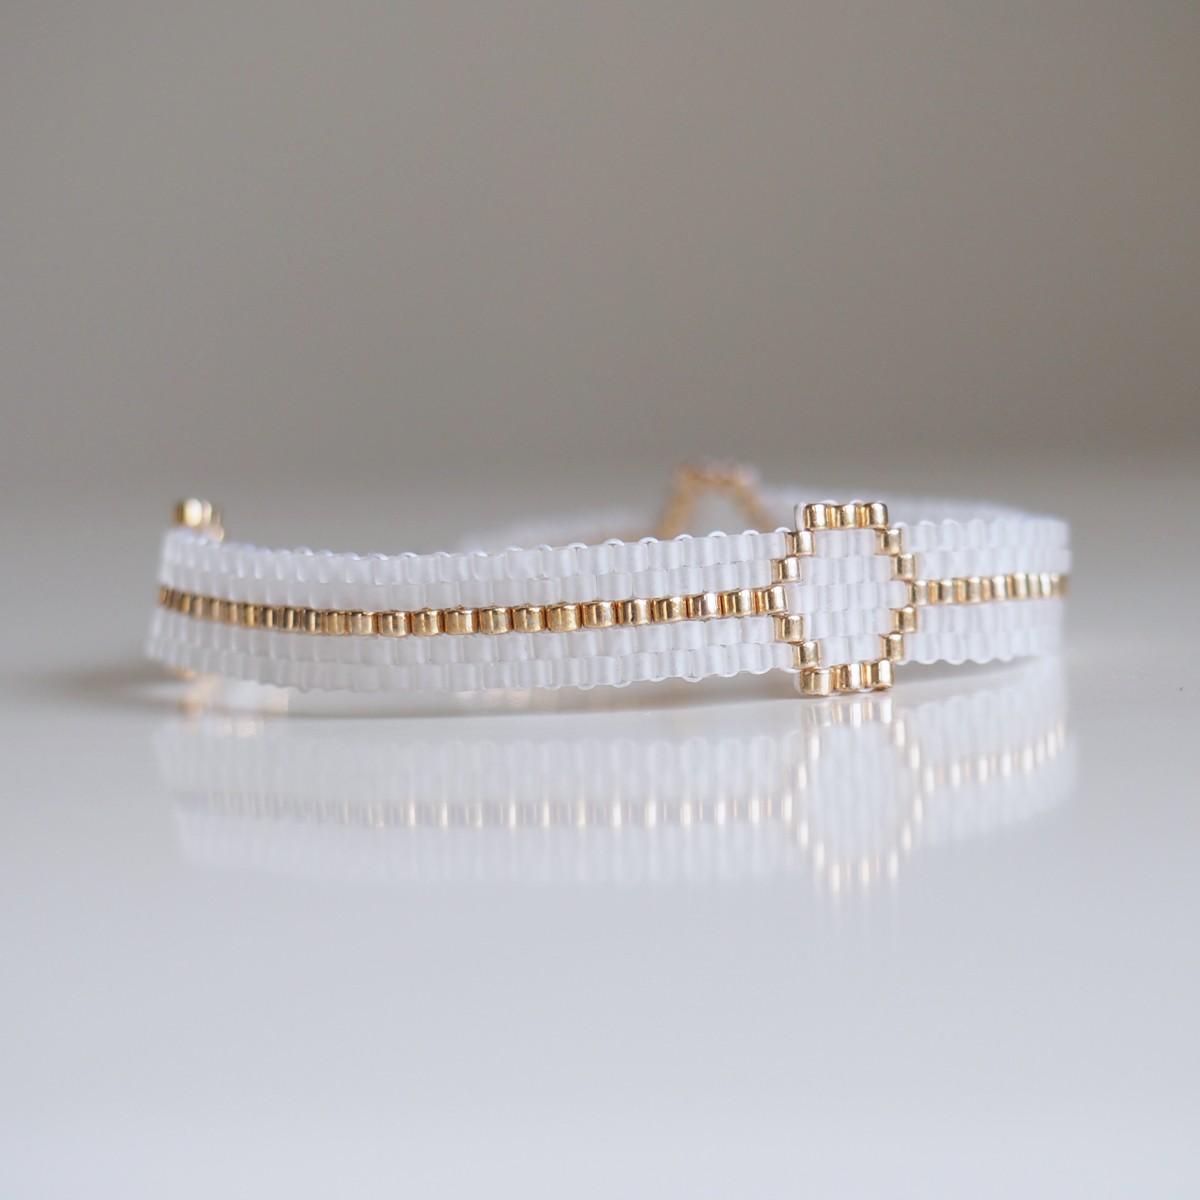 Apache helene ripoll bijoux papeterie de mariage - Bracelet perle et ruban ...